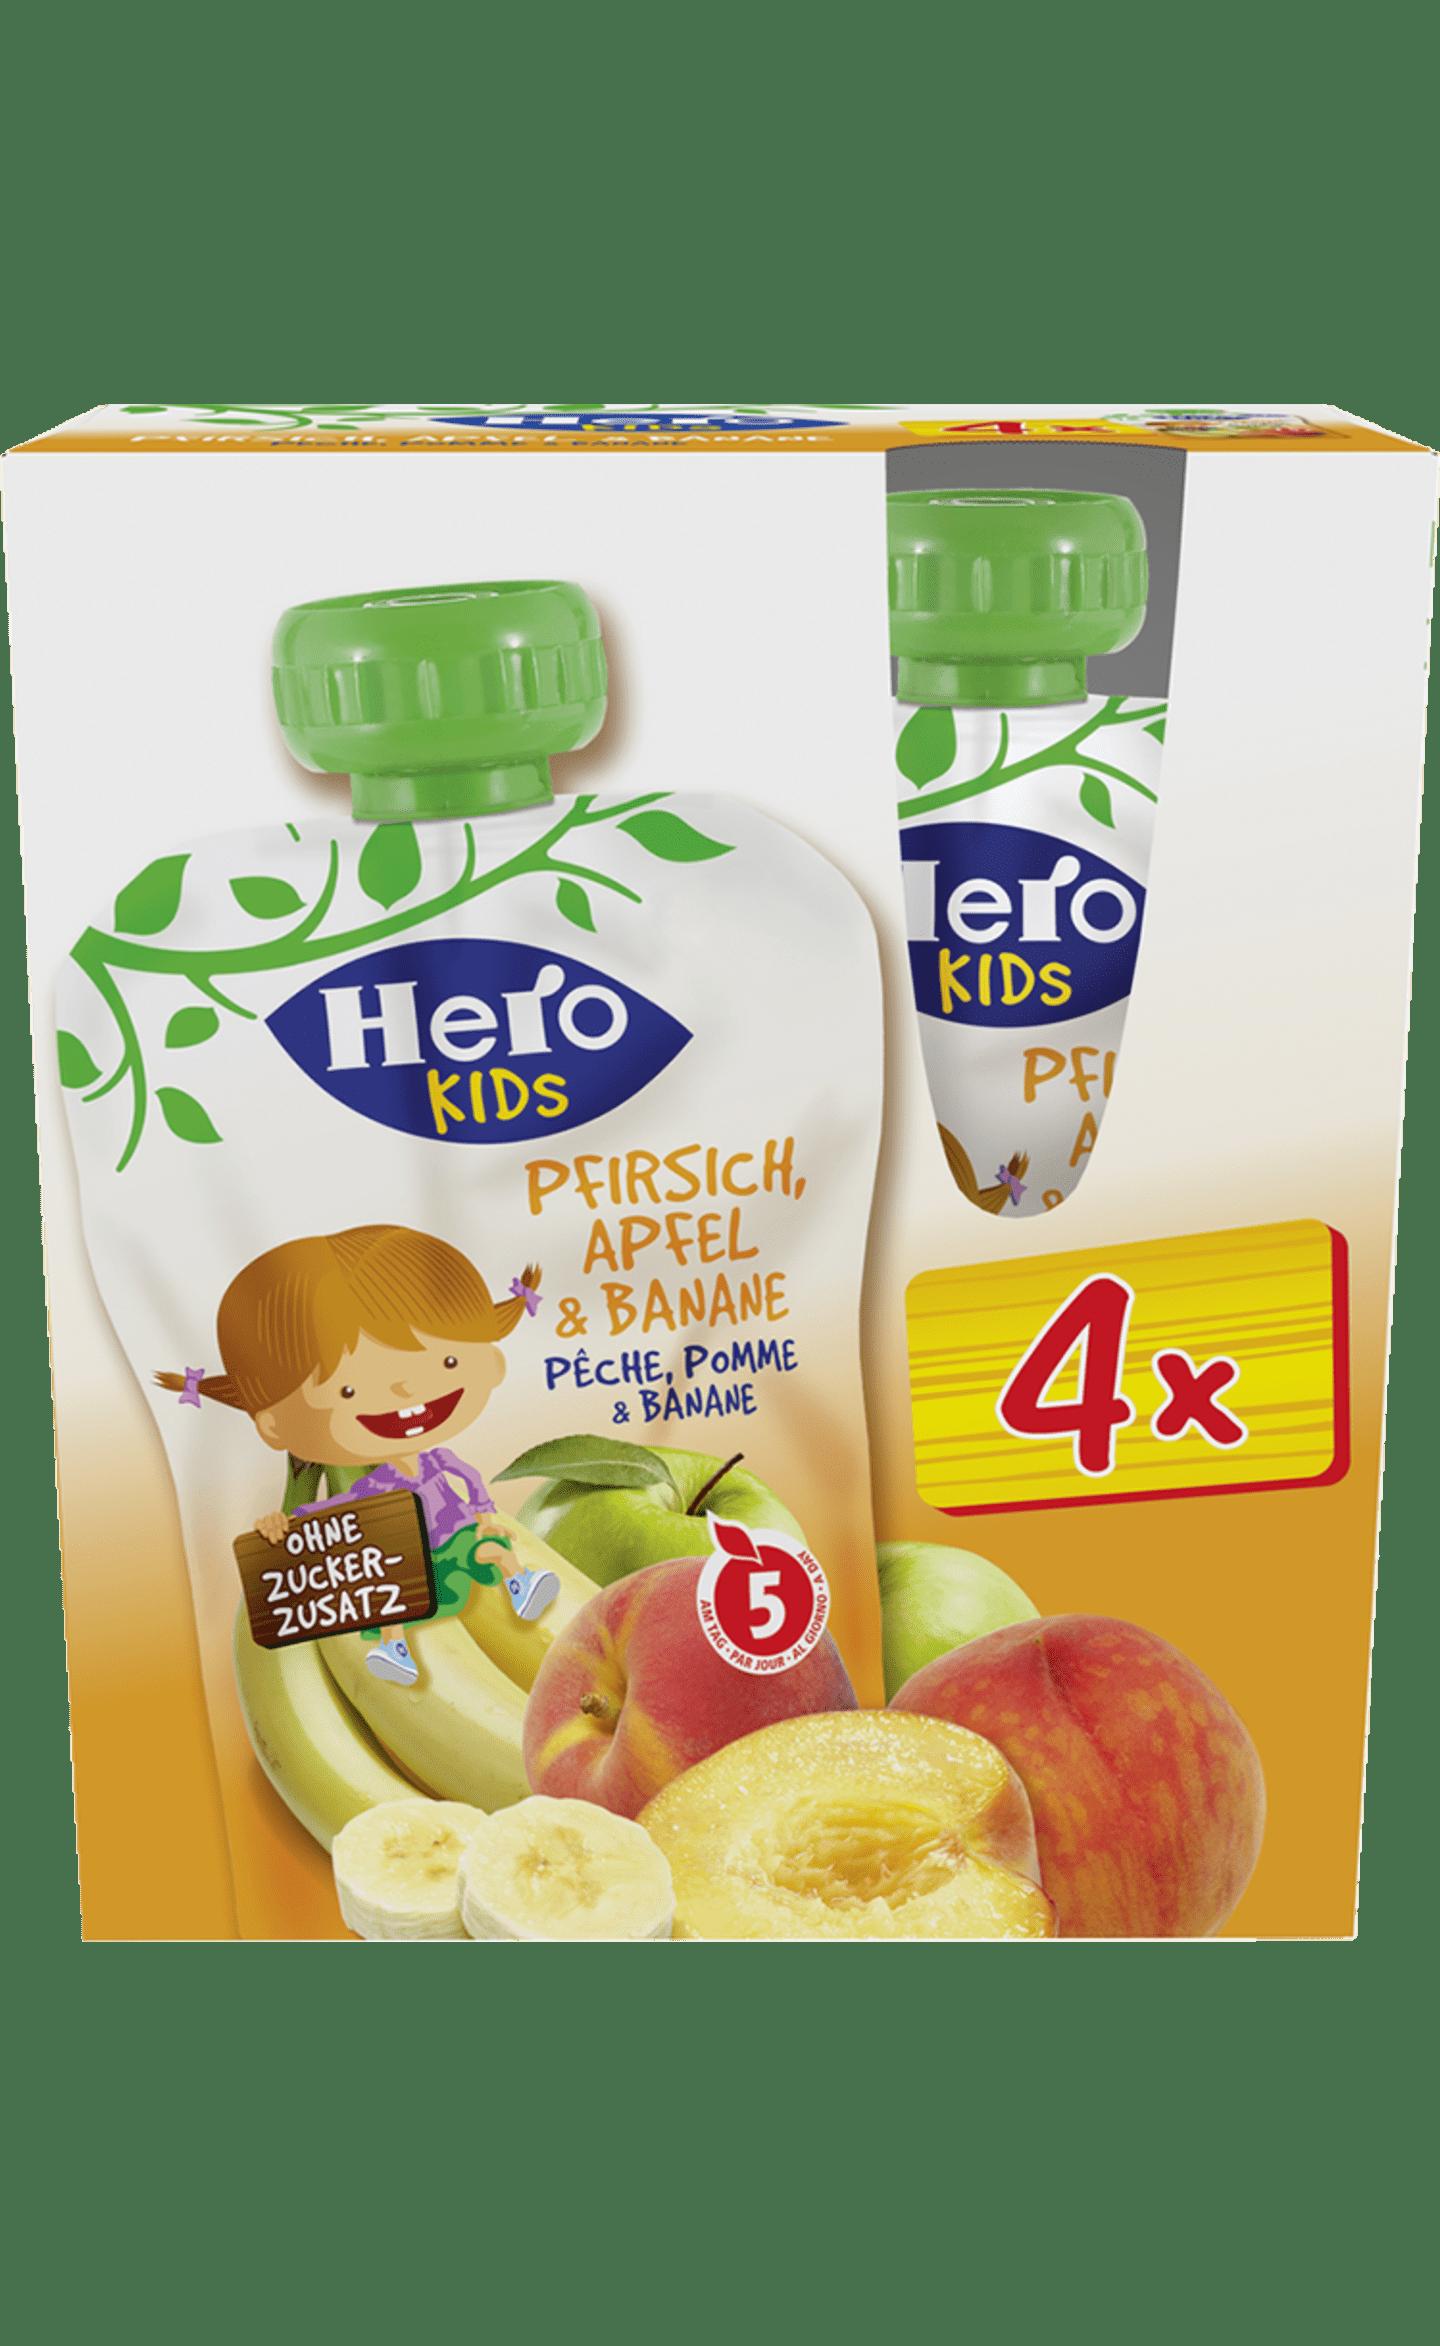 Hero Kids Pfirsich Apfel Banane